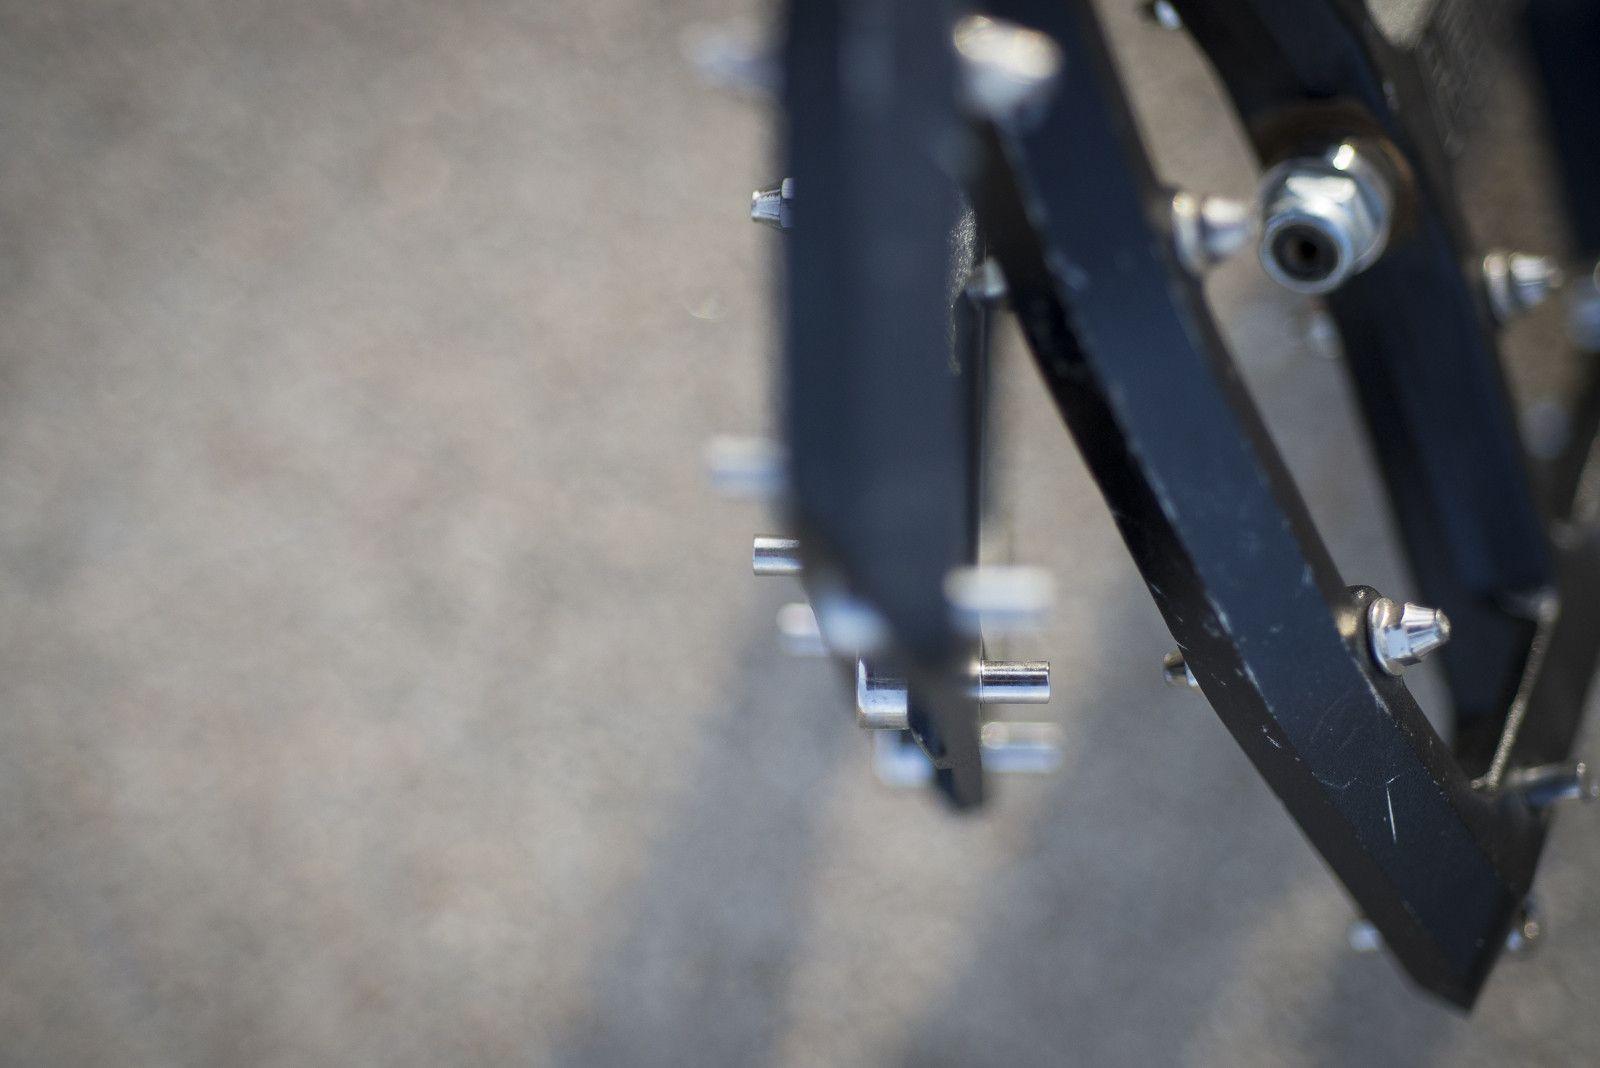 VP Components VP-Harrier Flat Pedal - Reviews, Comparisons, Specs - Mountain Bike Flat Pedals - Vital MTB